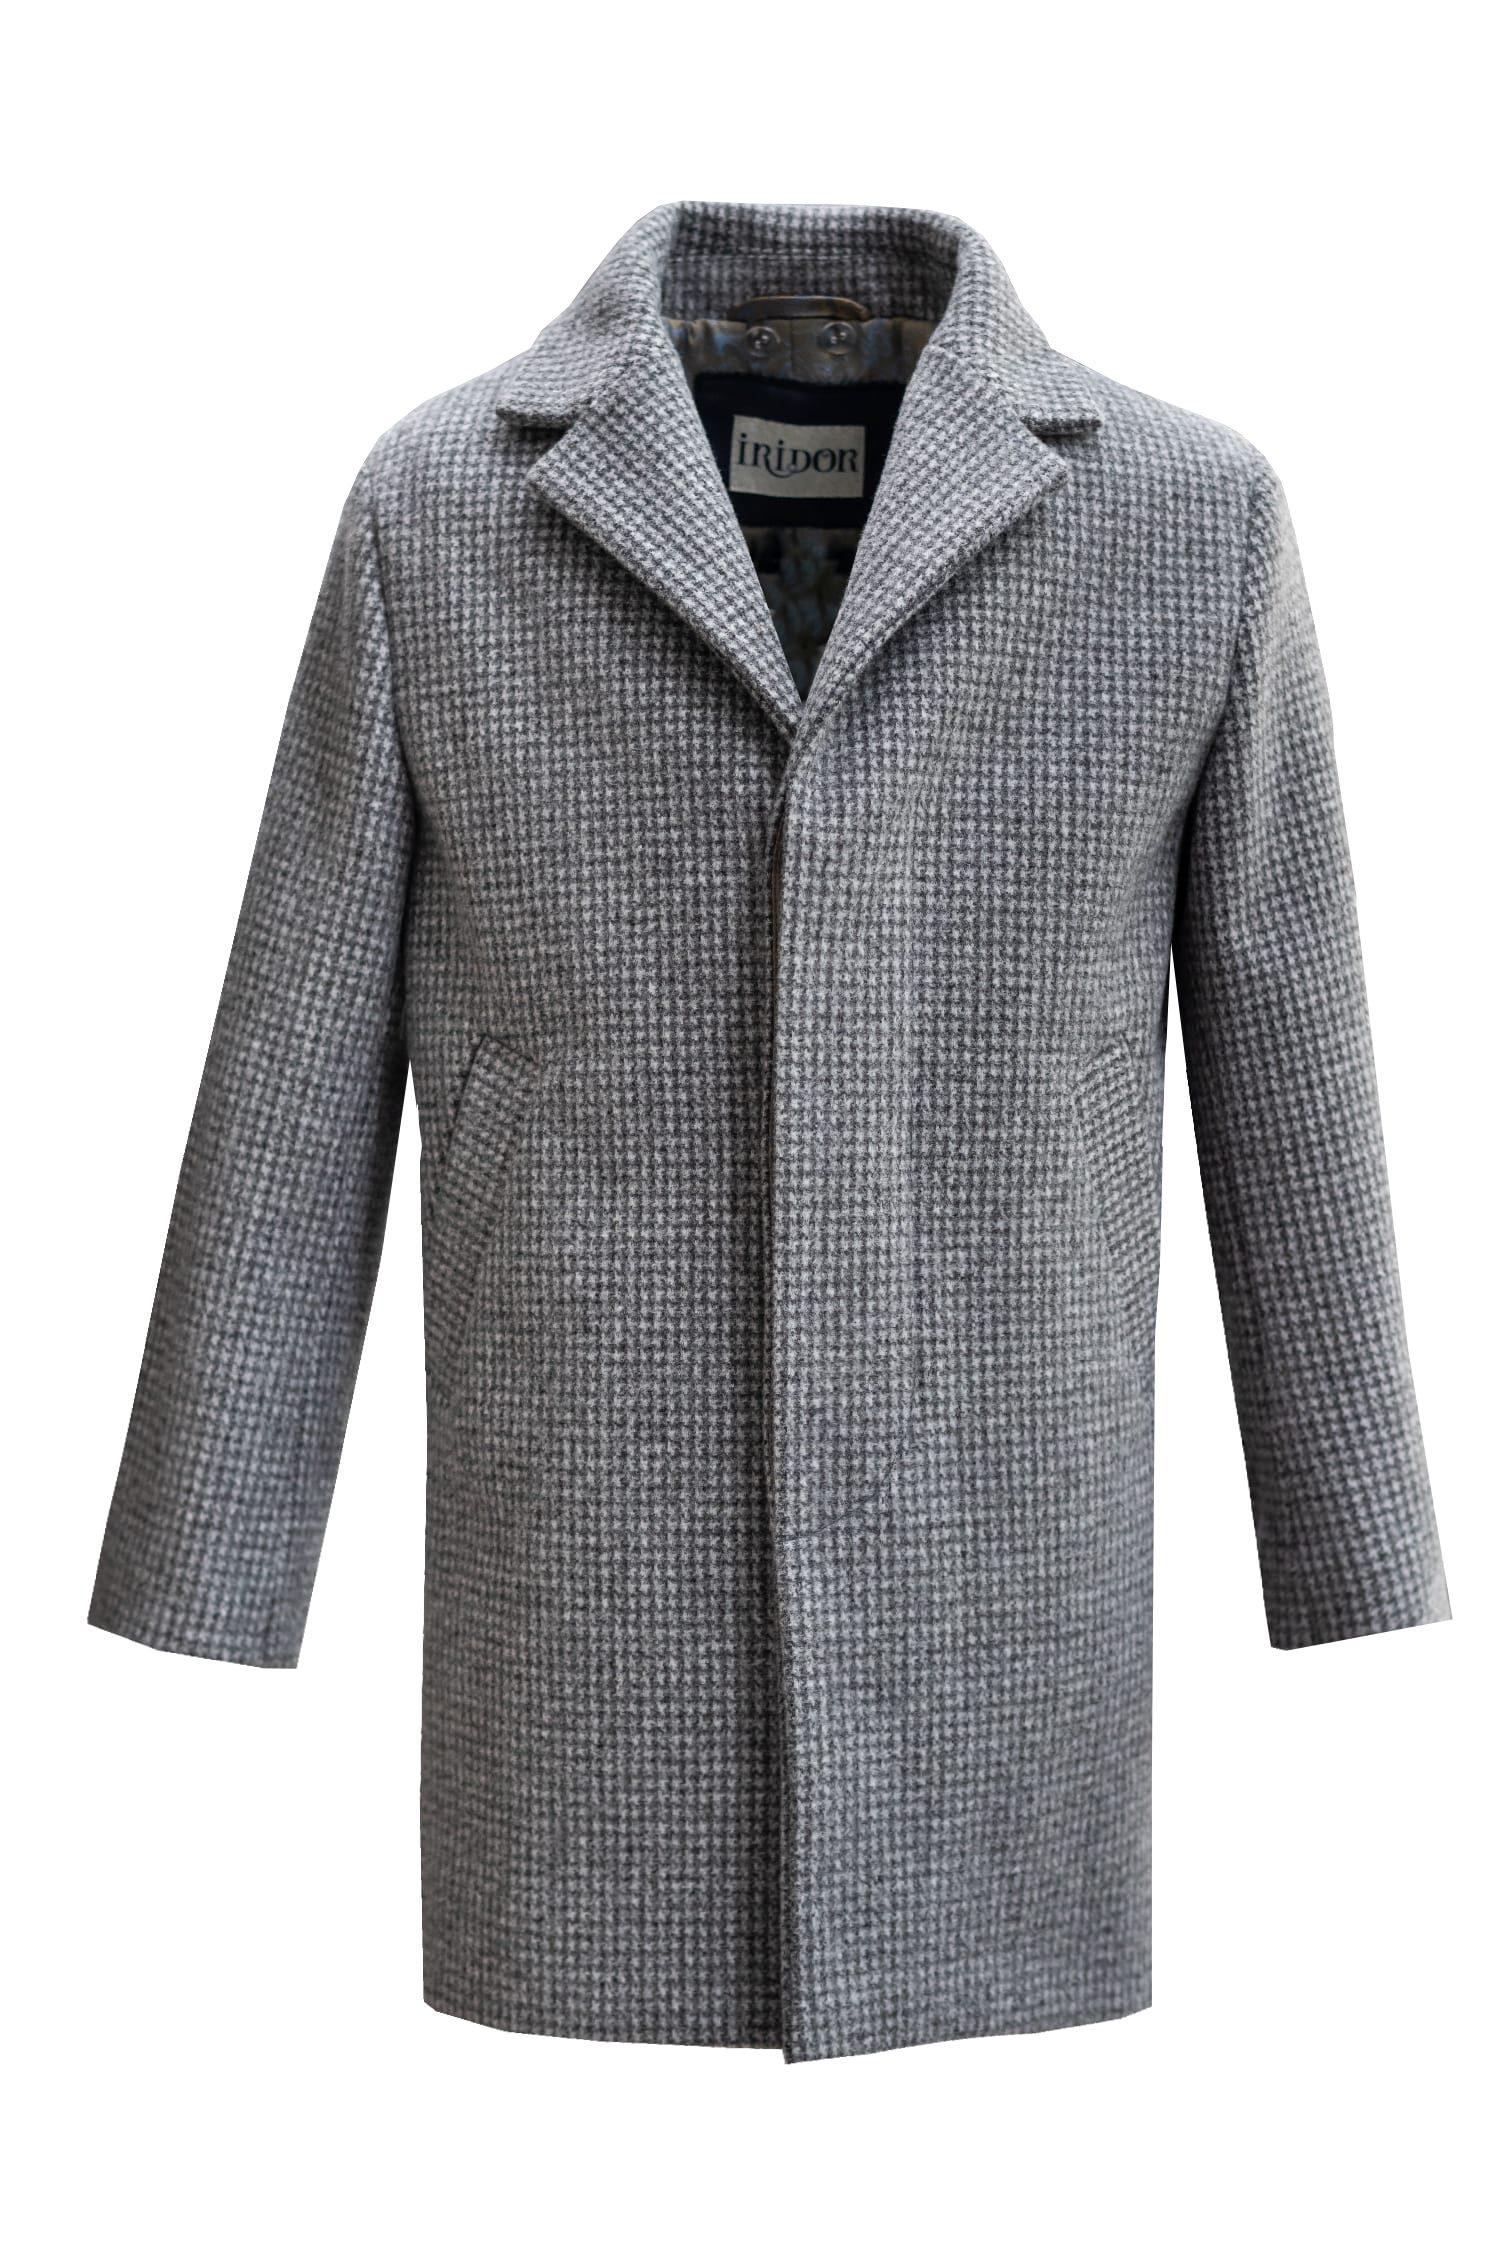 Palton gri pentru băieți Vladimir